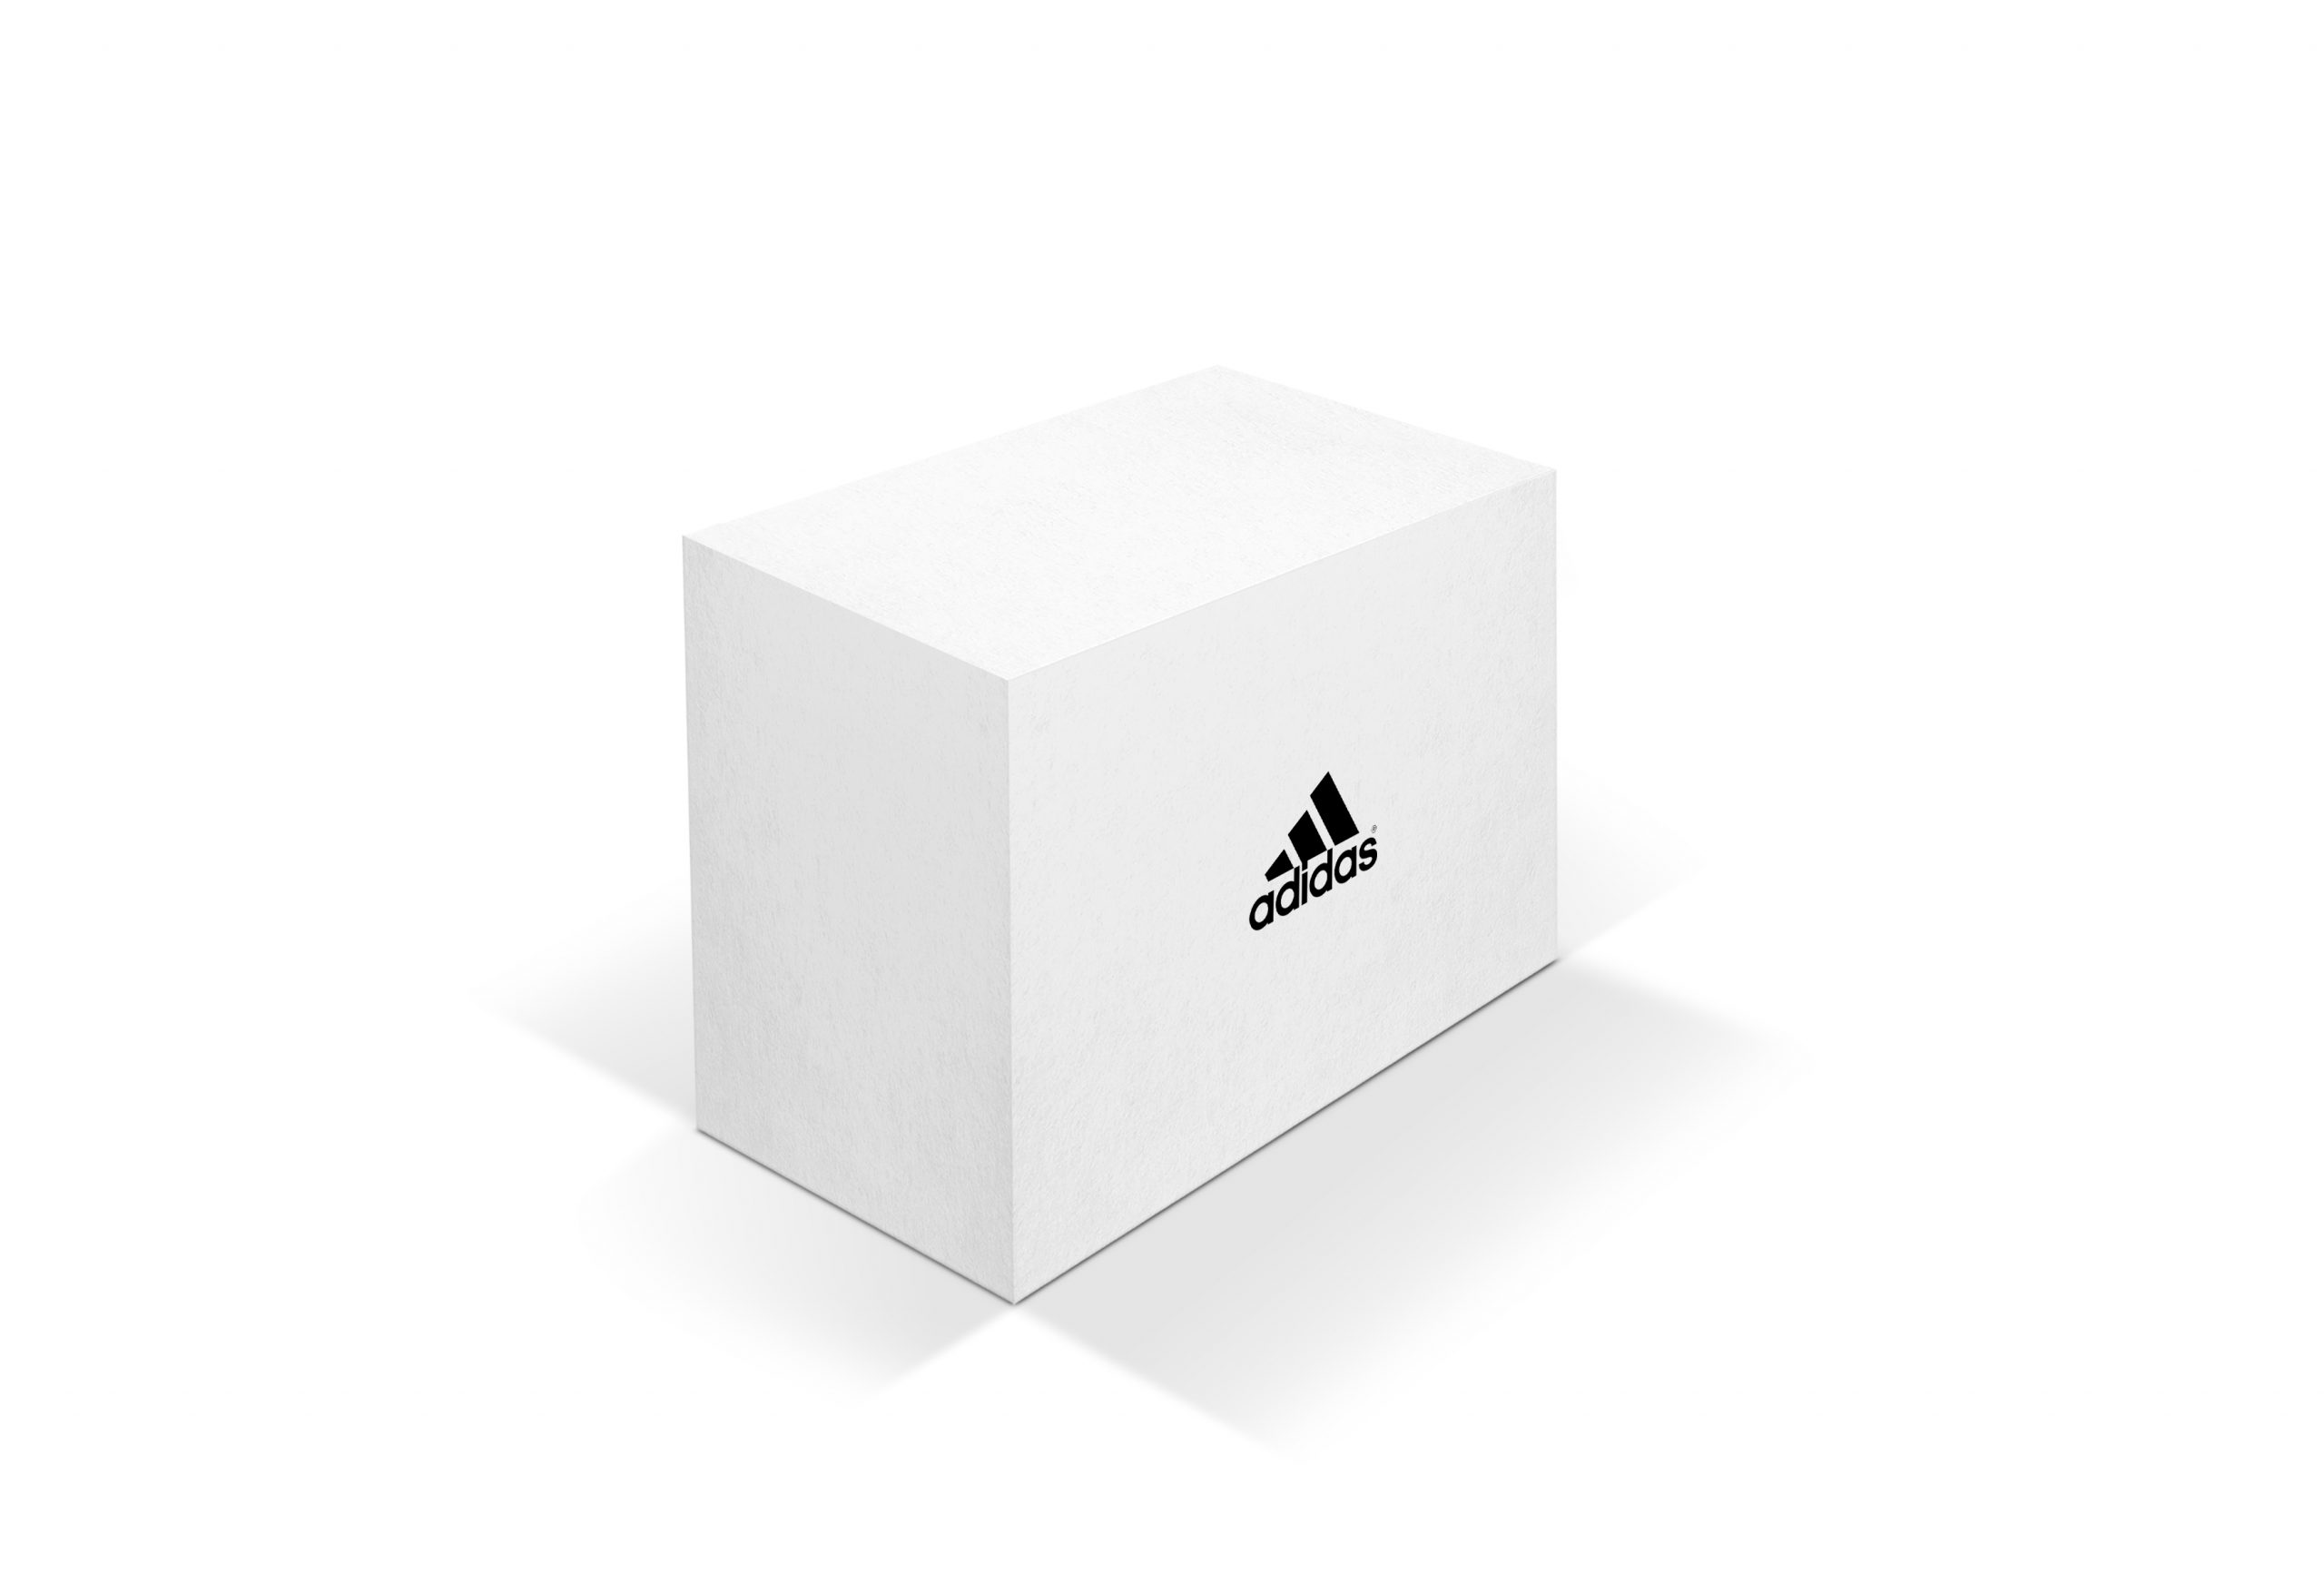 Adidas_caixa_personalizada